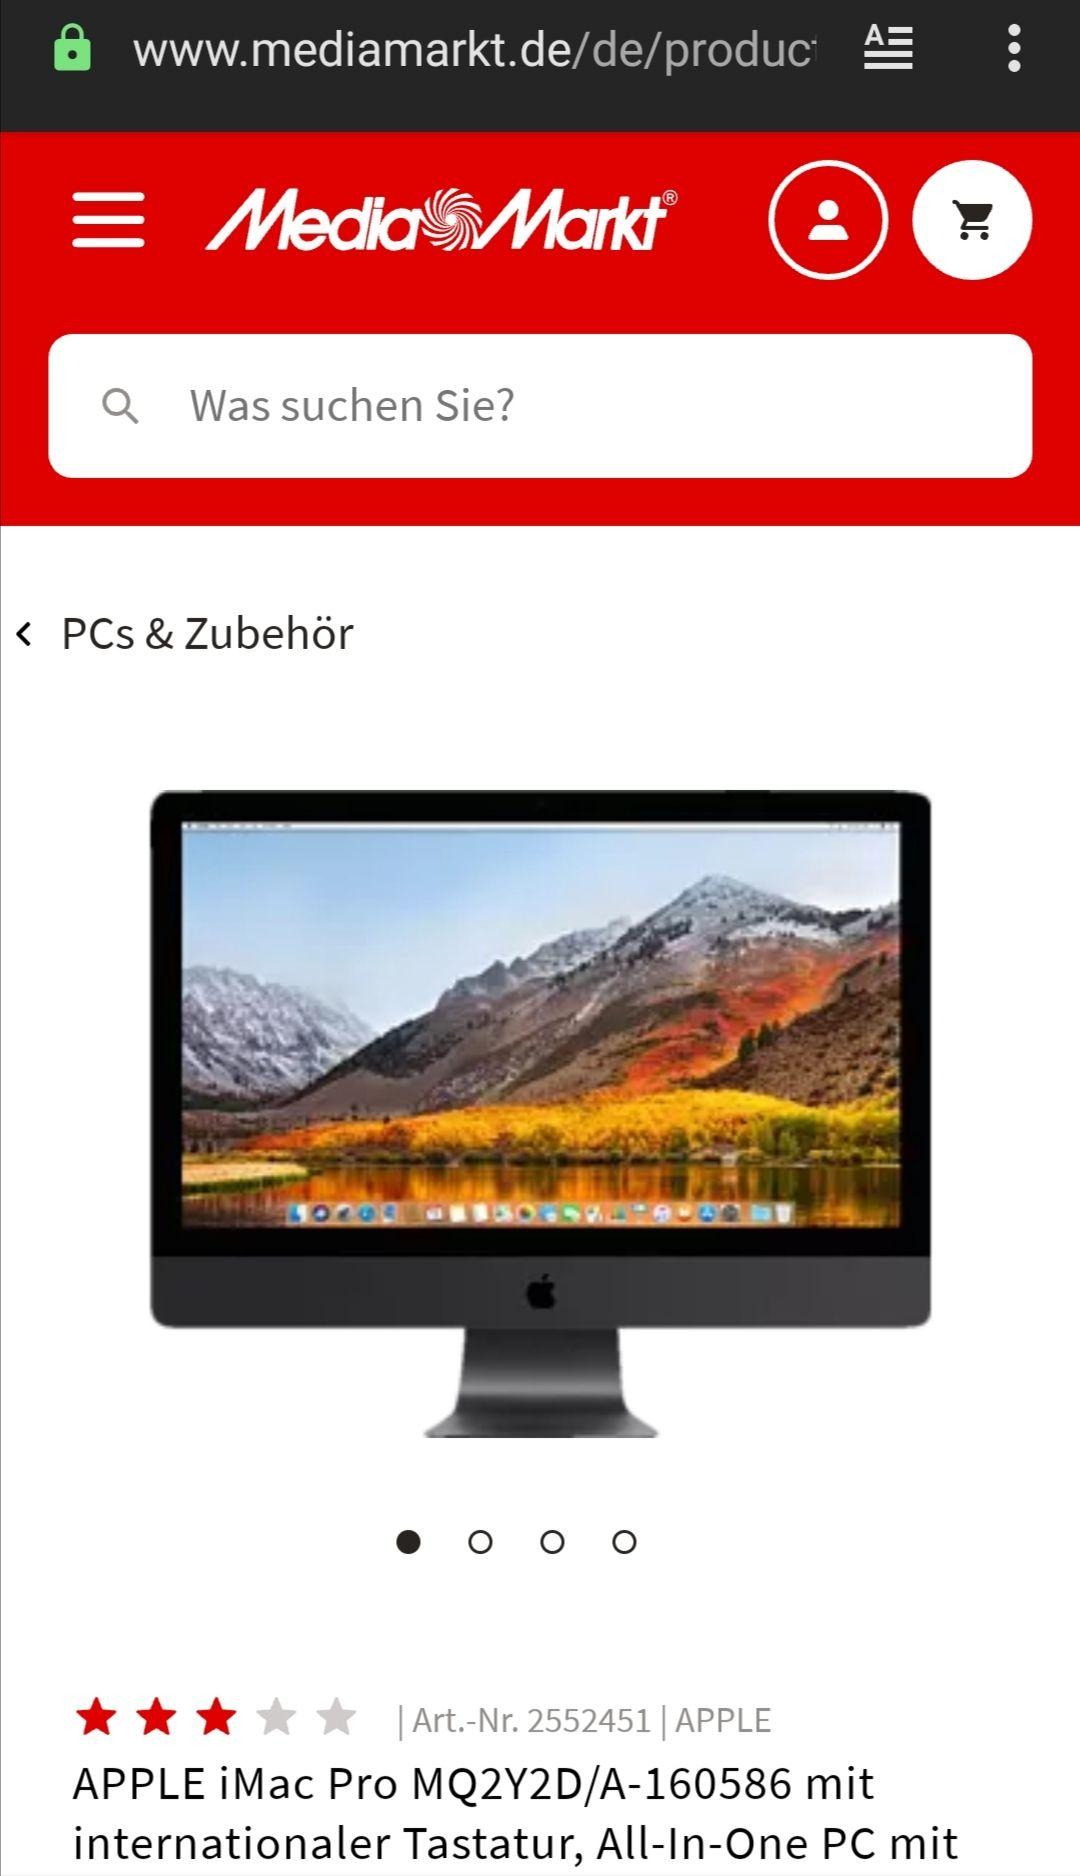 APPLE iMac Pro MQ2Y2D/A-160586